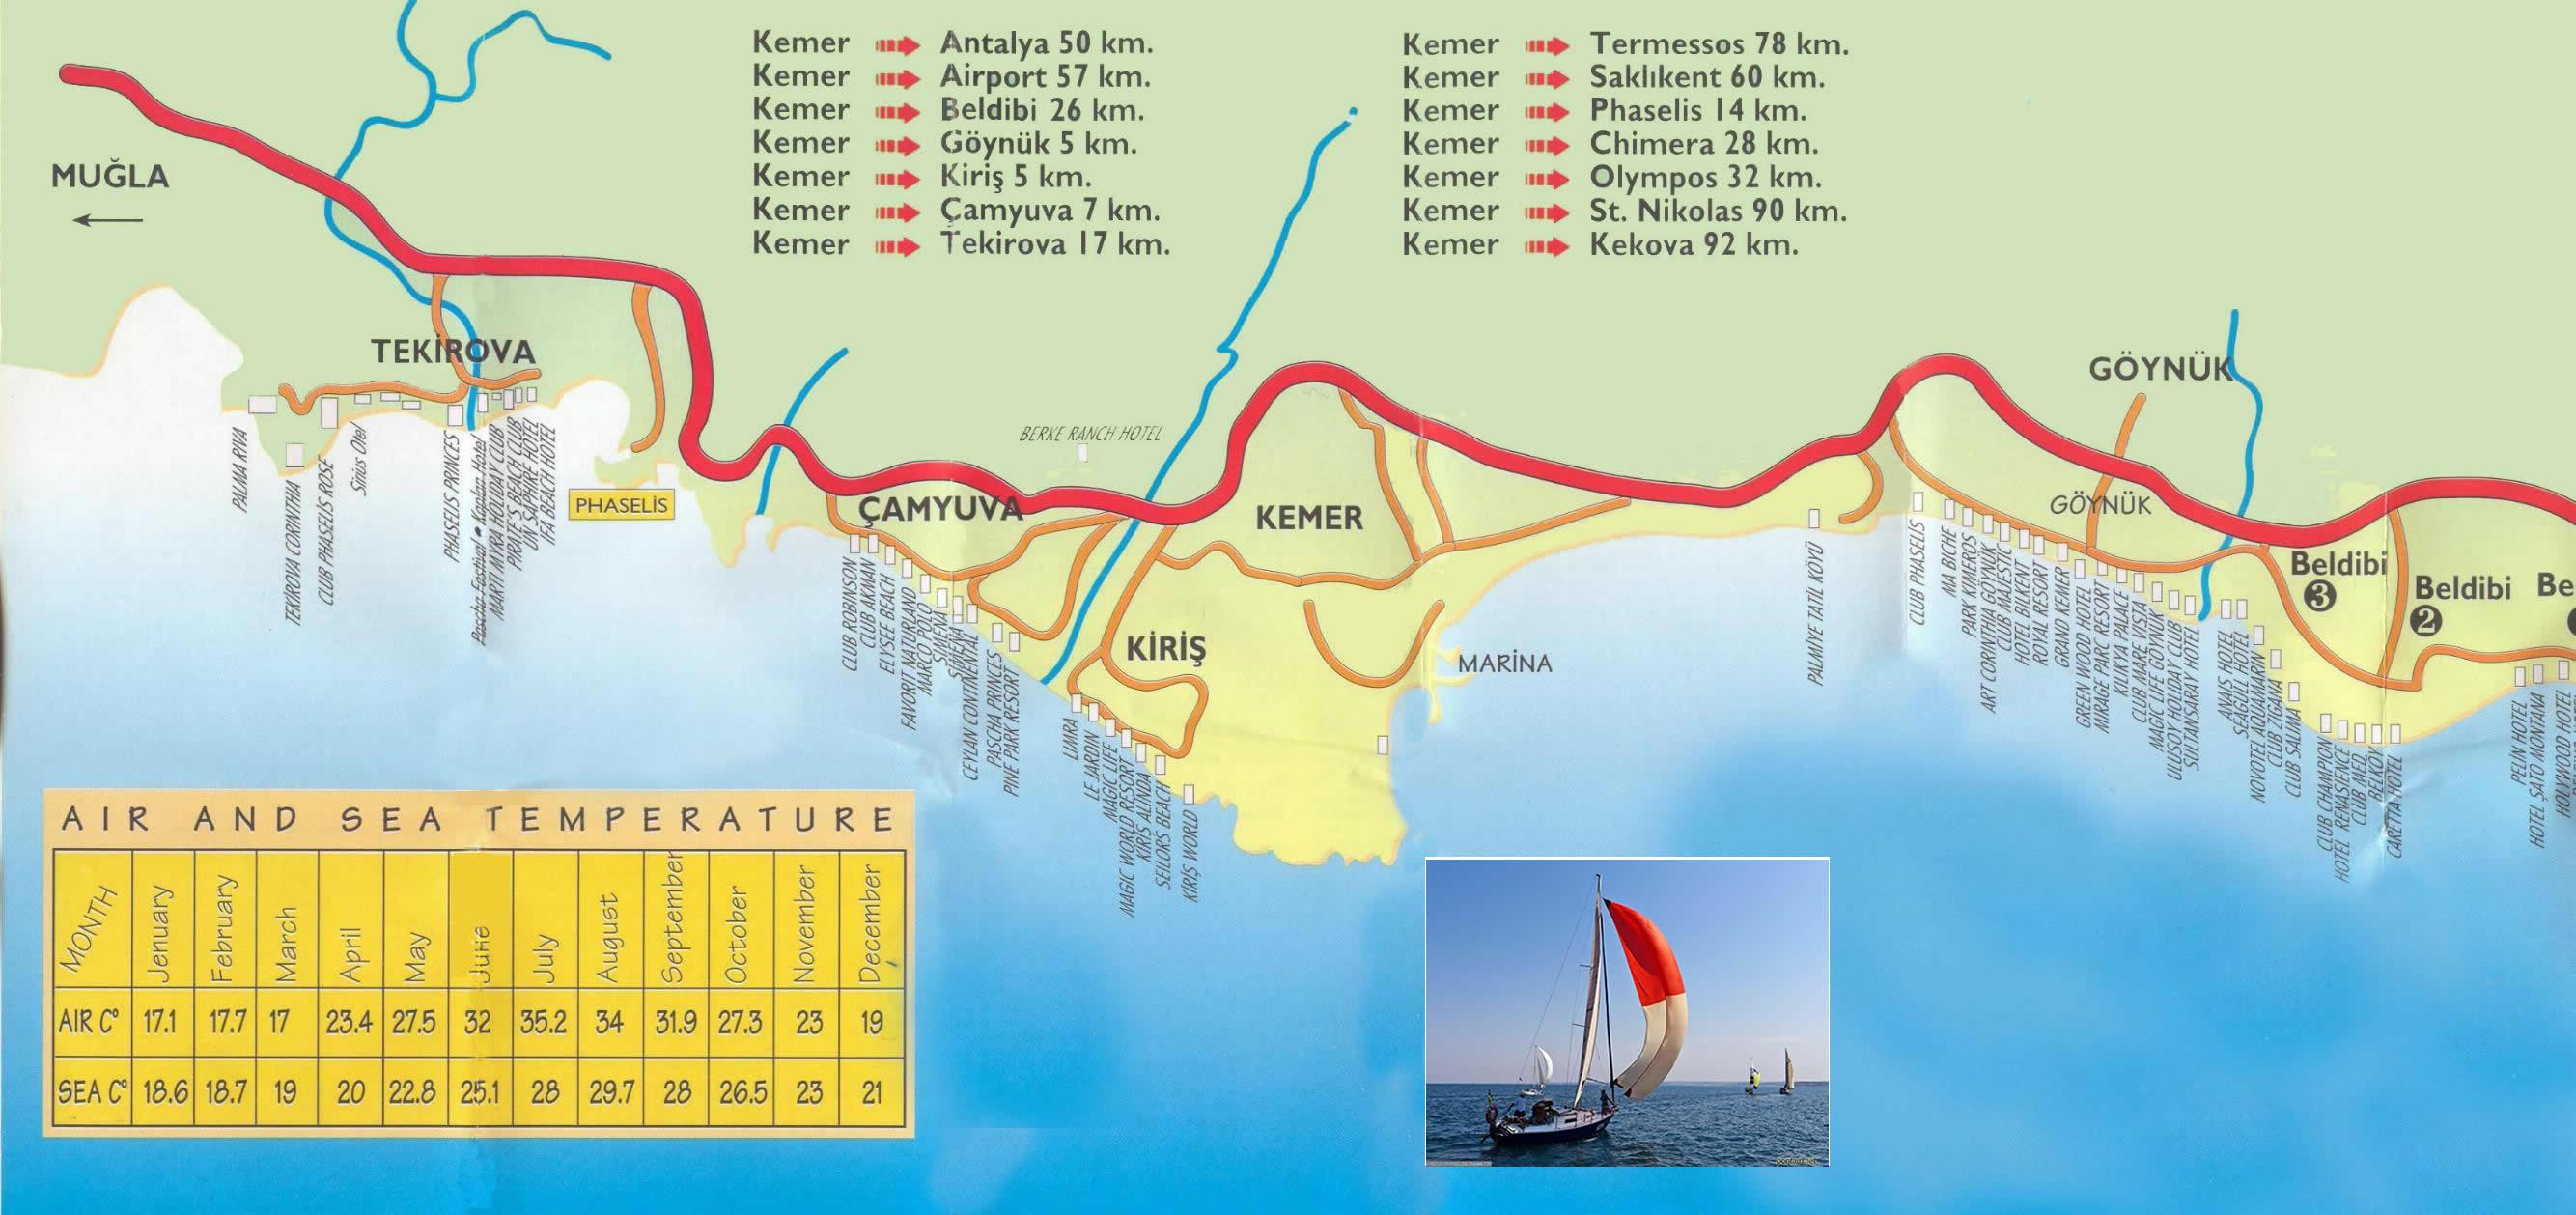 Карта пригорода кемера